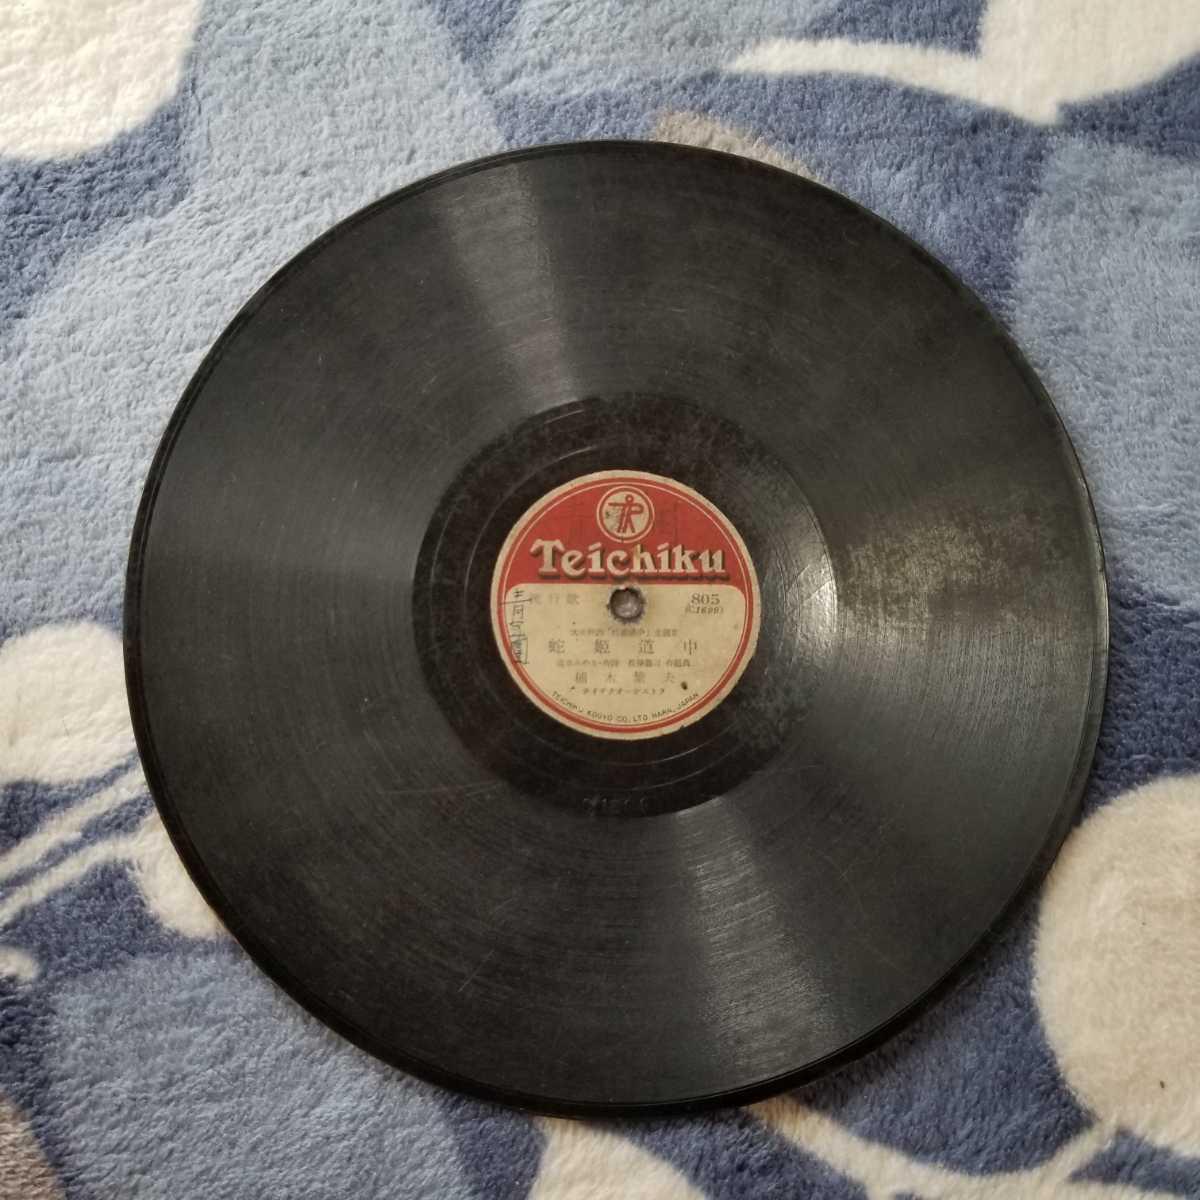 流行歌 映画主題歌 蛇姫道中 楠木繁夫 他不明 蓄音機SPレコード盤10インチ(25cm) (39_画像2